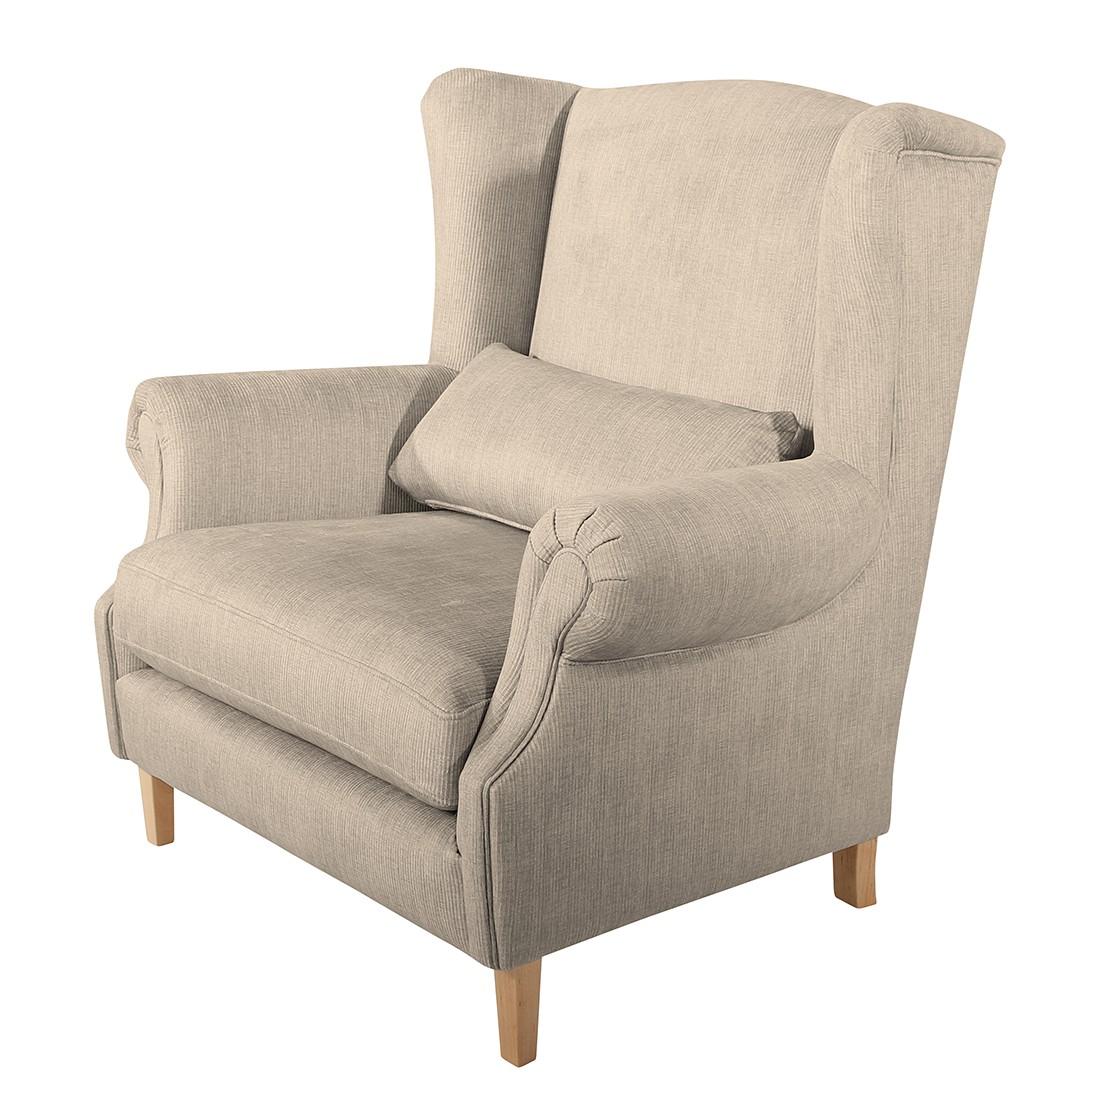 ohrensessel kaufen finest best ohrensessel home affaire ohrensessel bigby kaufen with. Black Bedroom Furniture Sets. Home Design Ideas